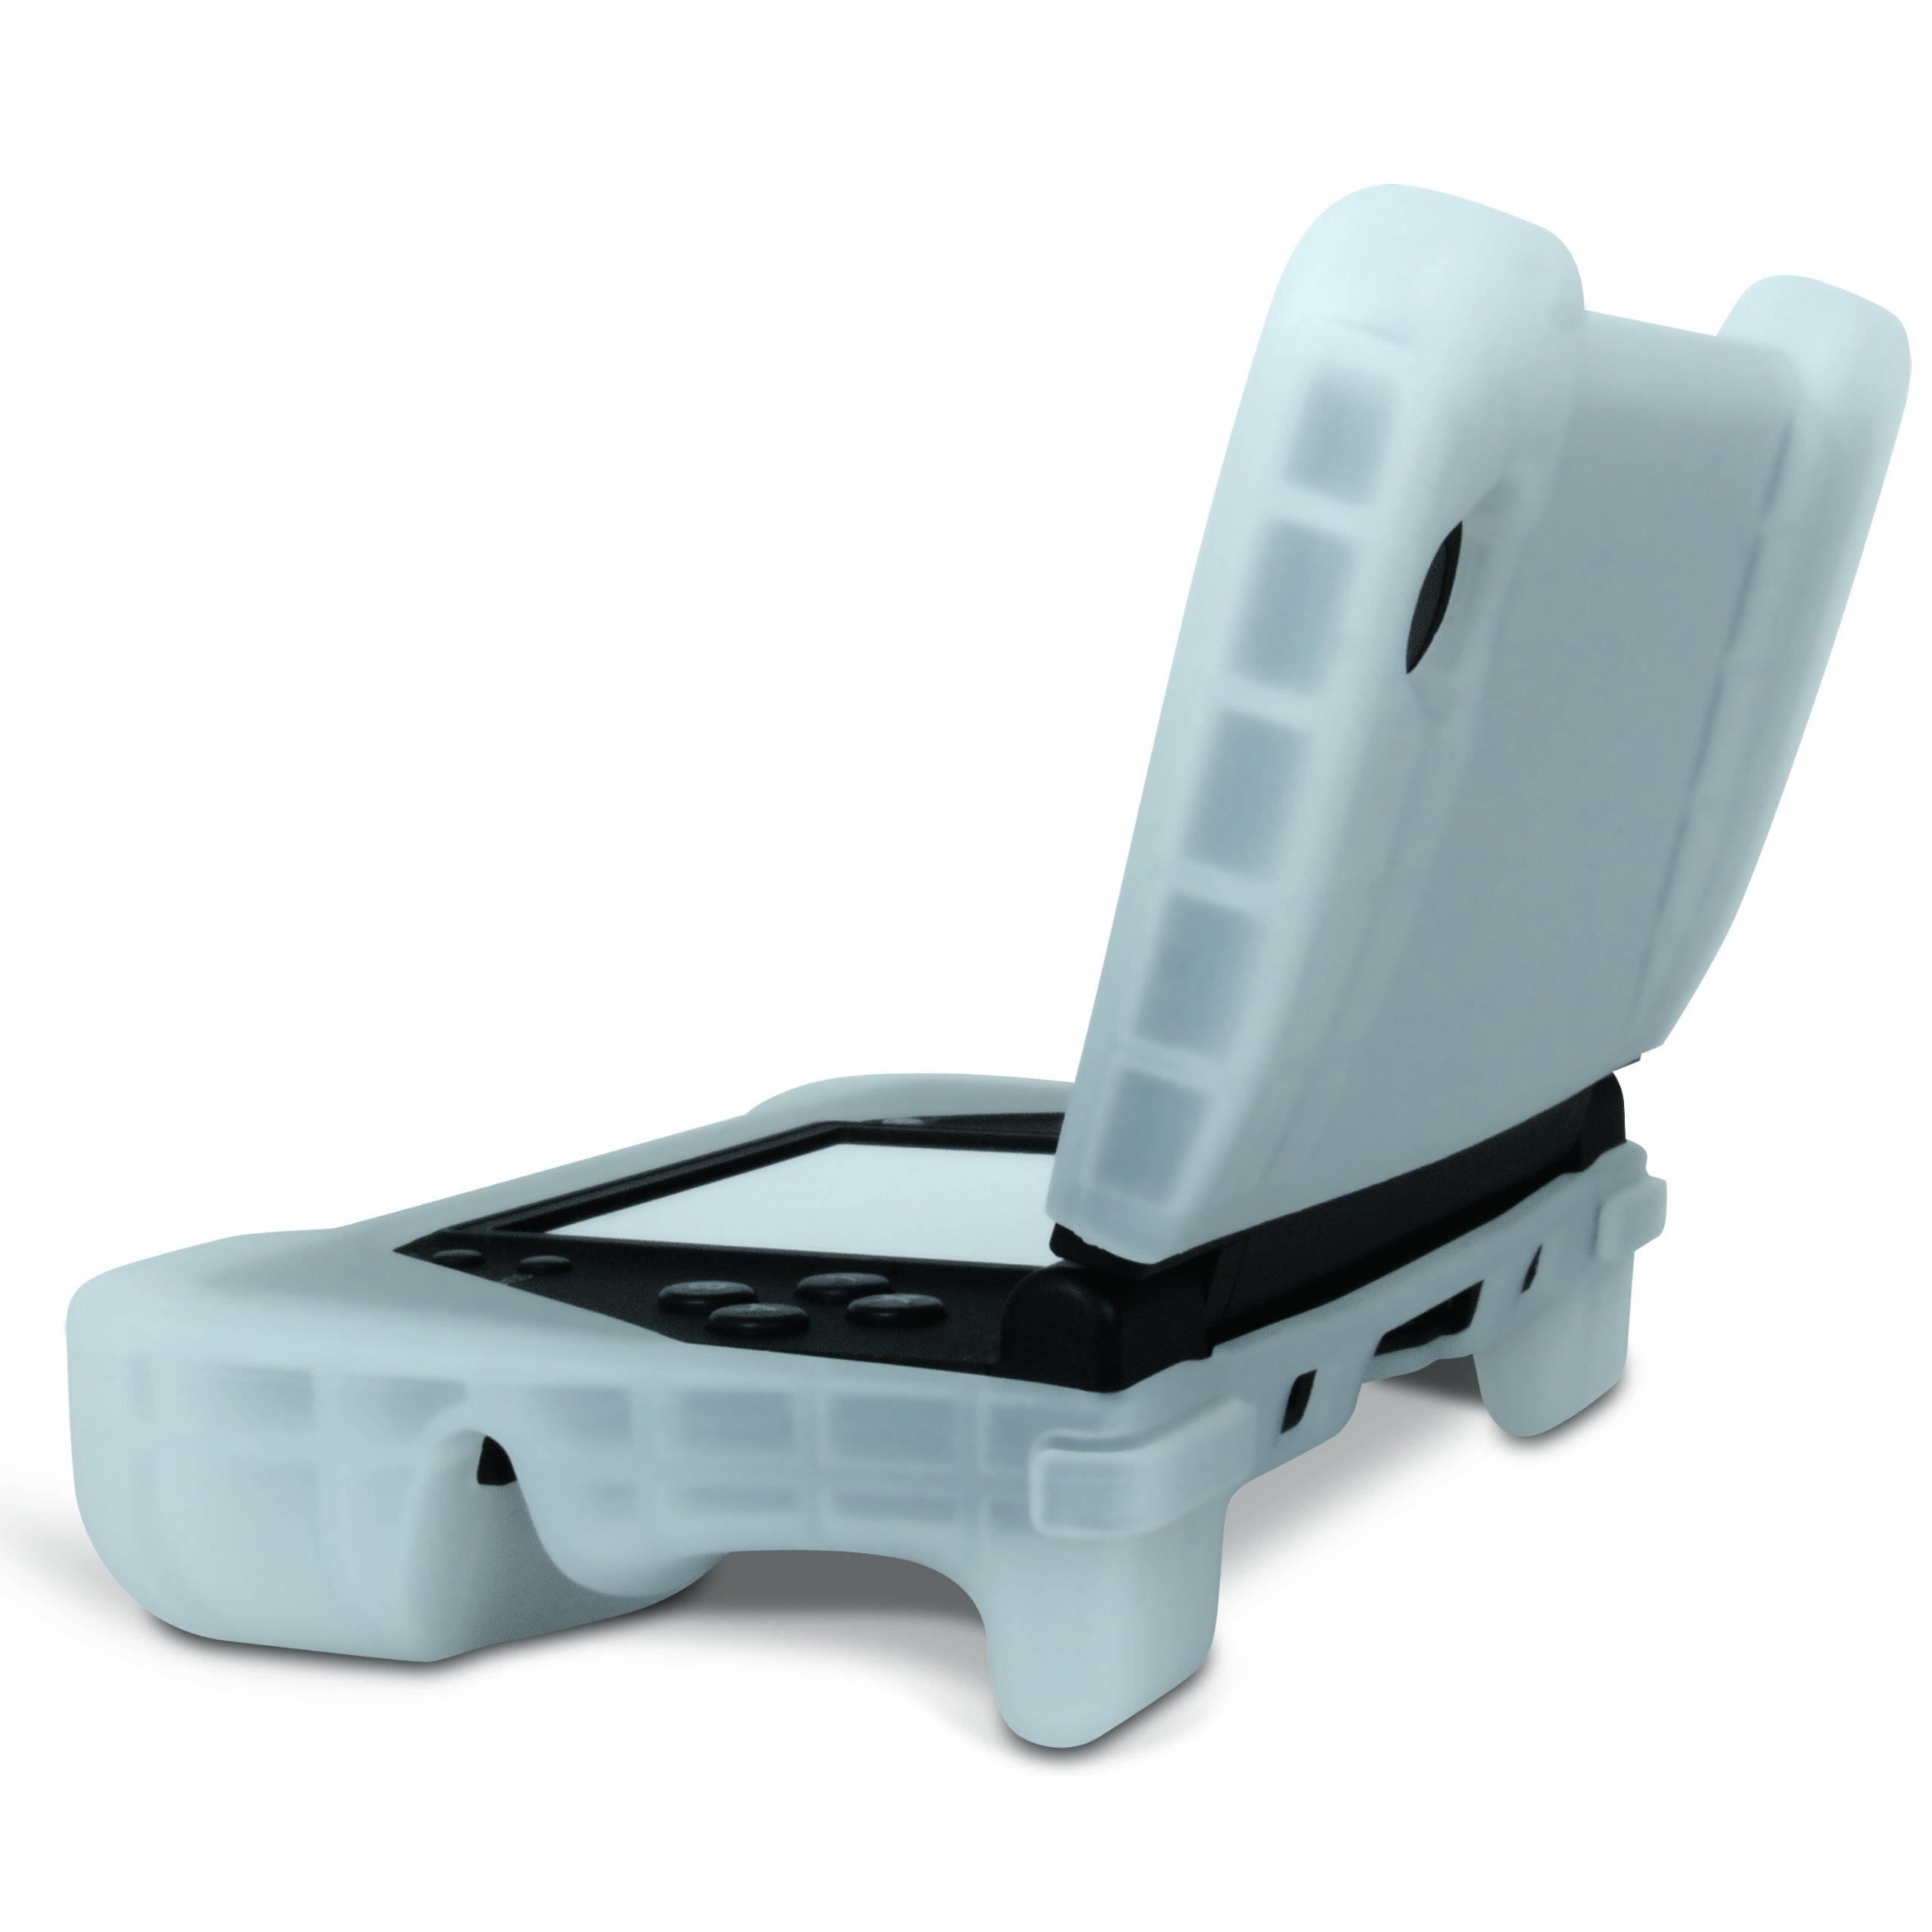 Nintendo DSi Comfort Grip - White